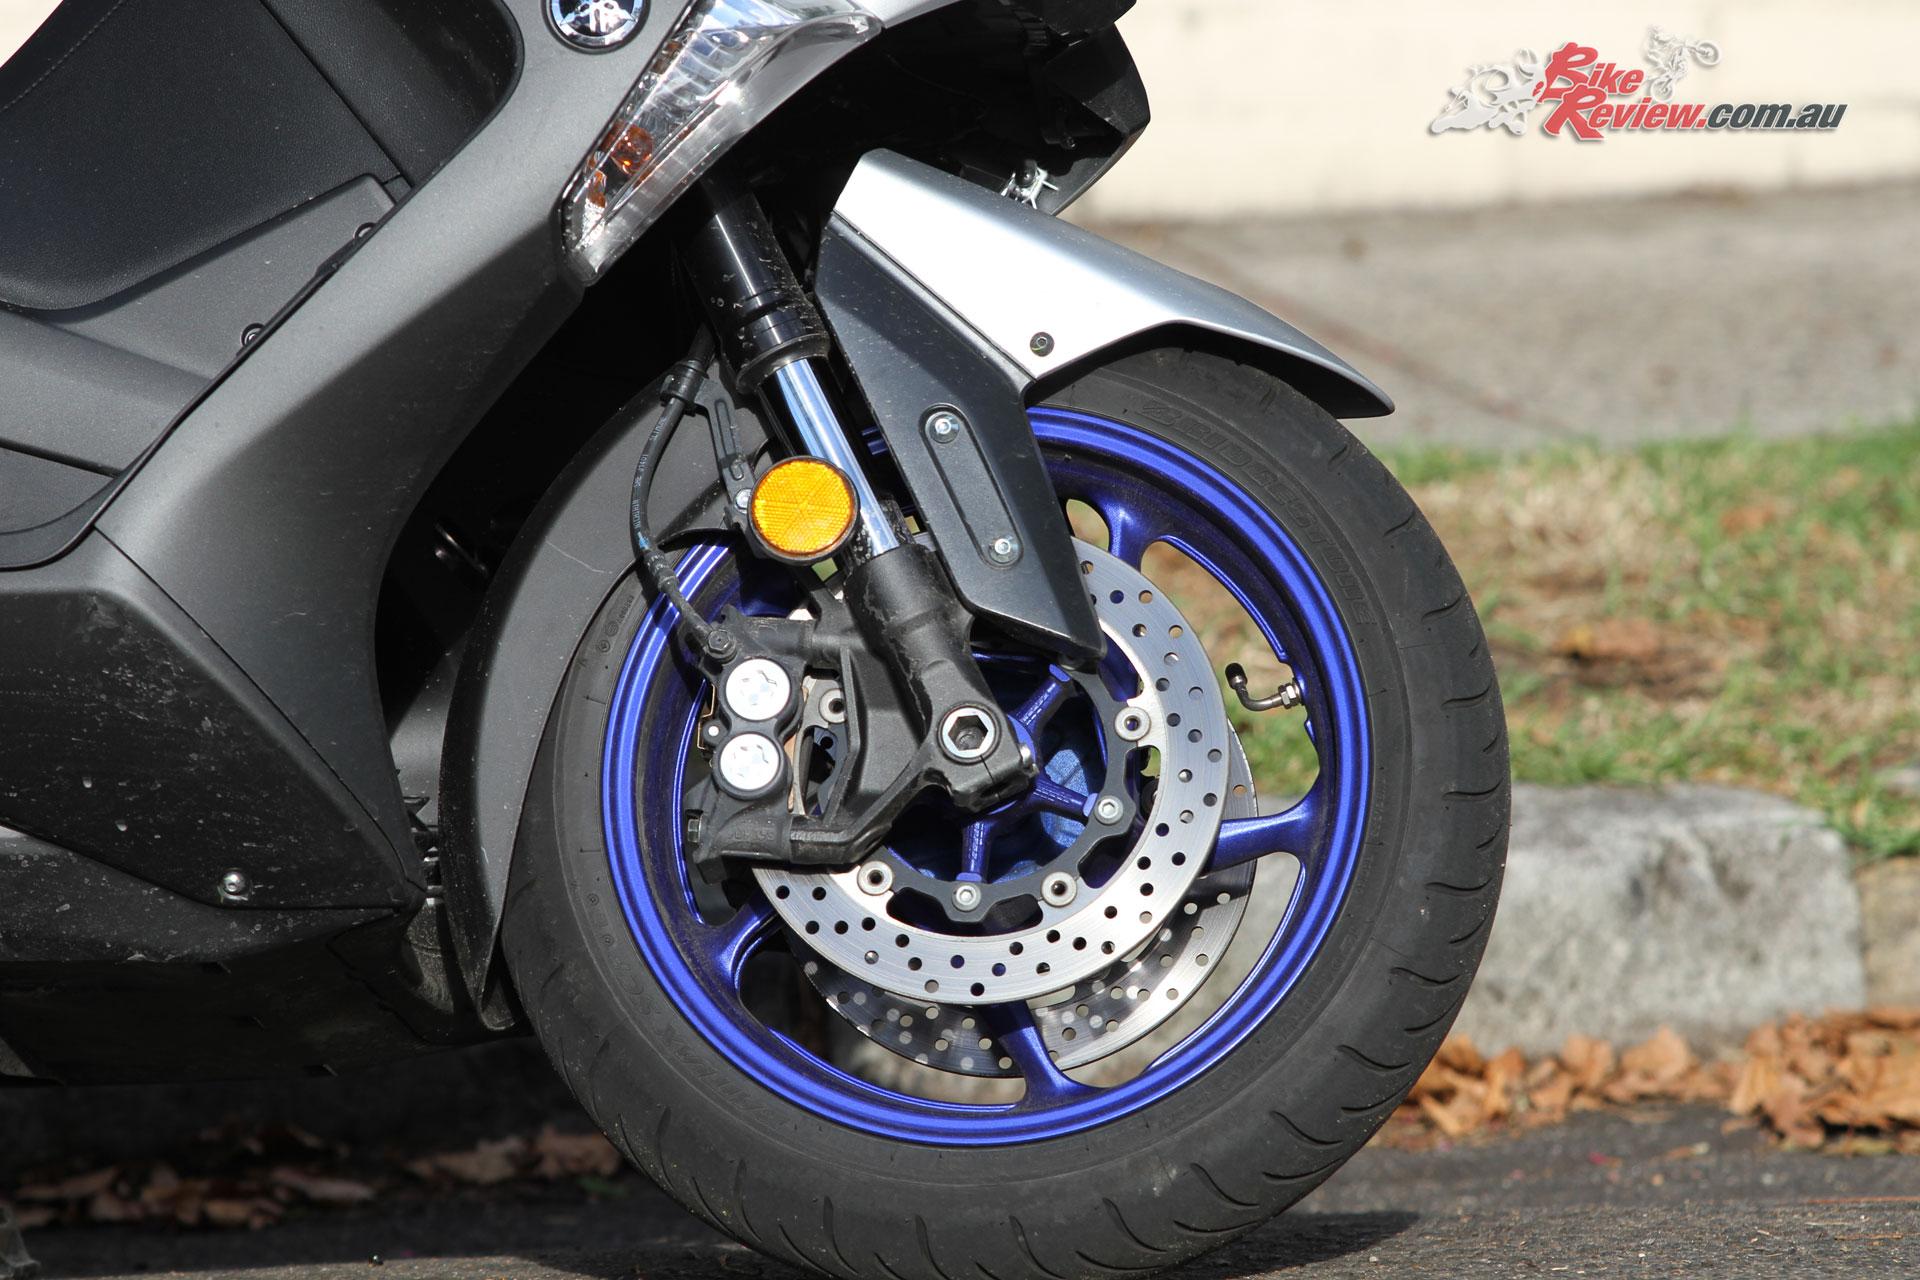 Review: 2018 Yamaha TMax 530 SX LAMS - Bike Review